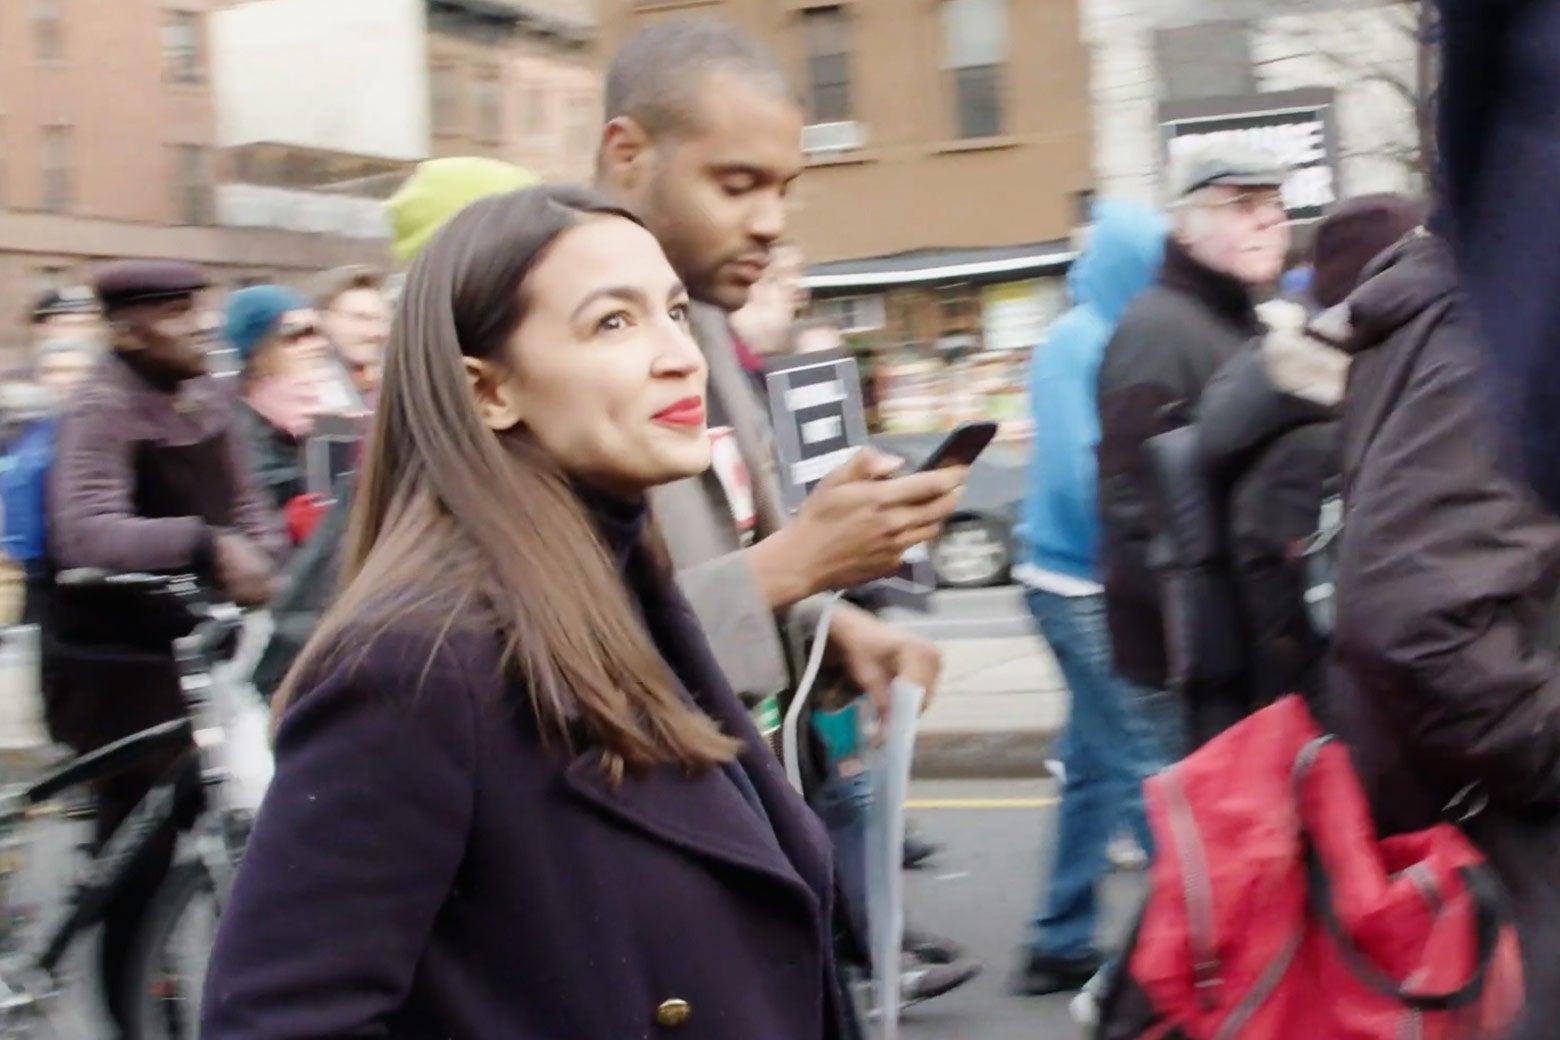 Alexandria Ocasio-Cortez in the documentary.